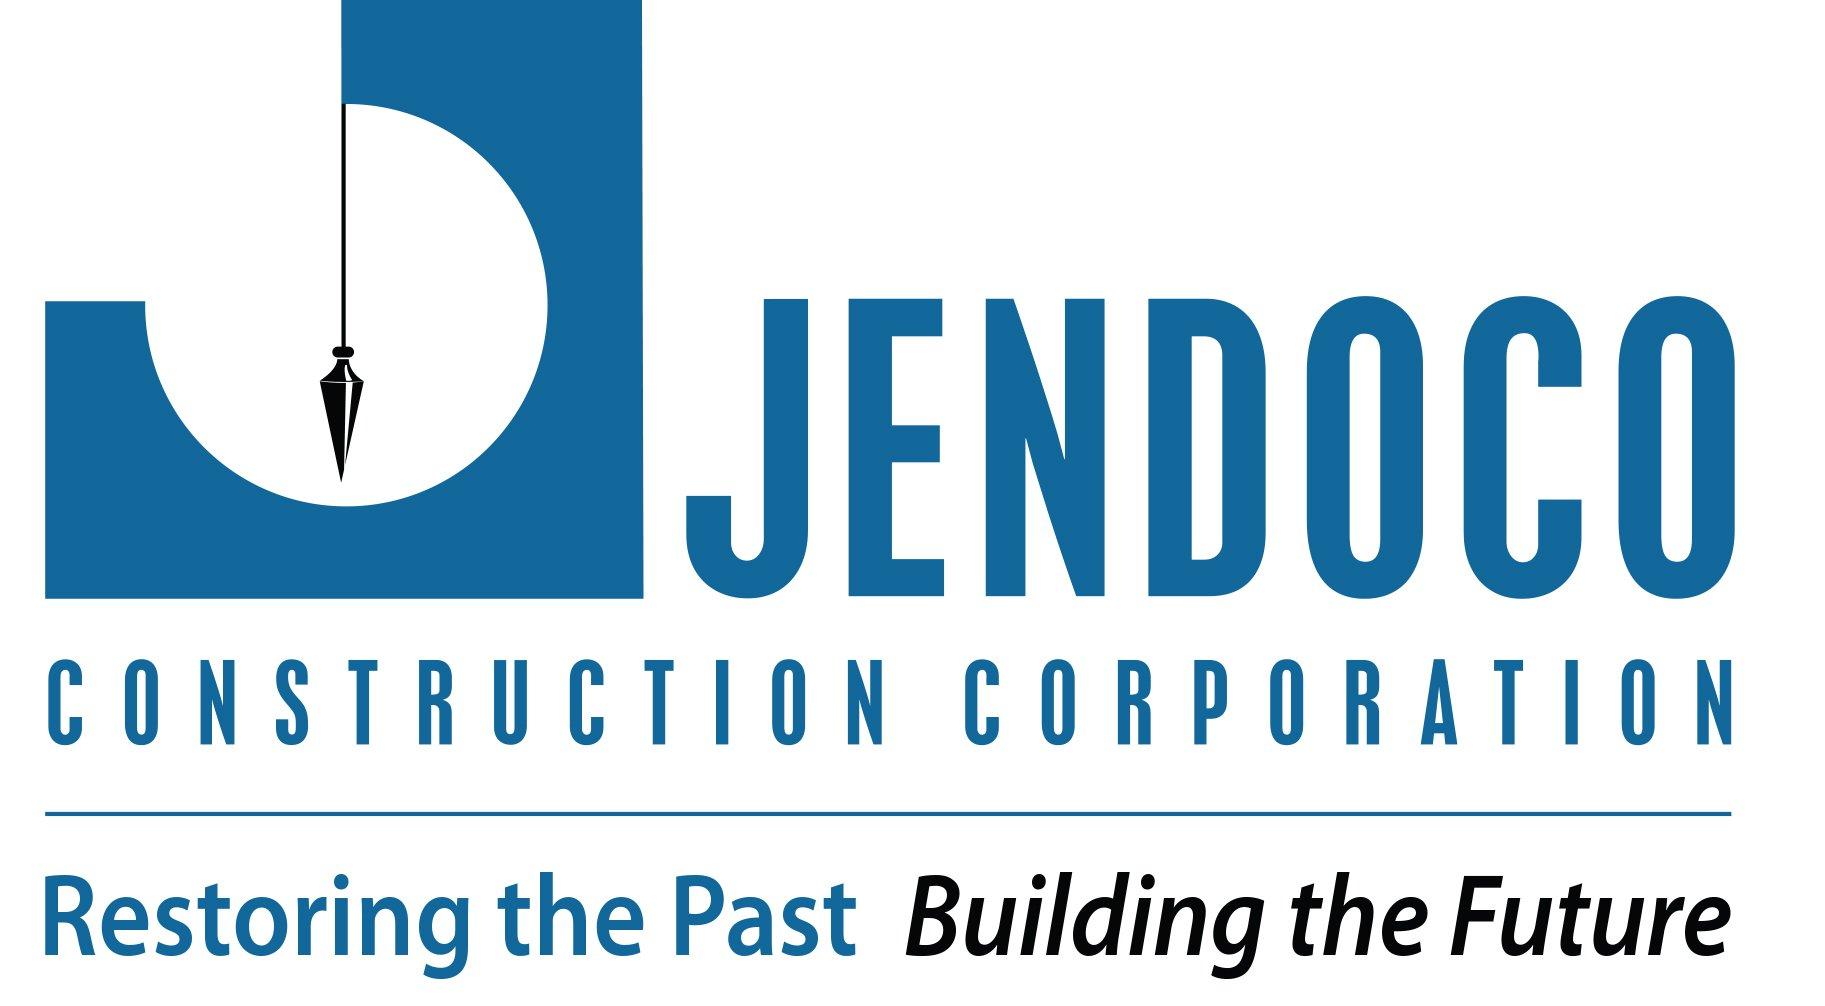 Jendoco Construction Corporation